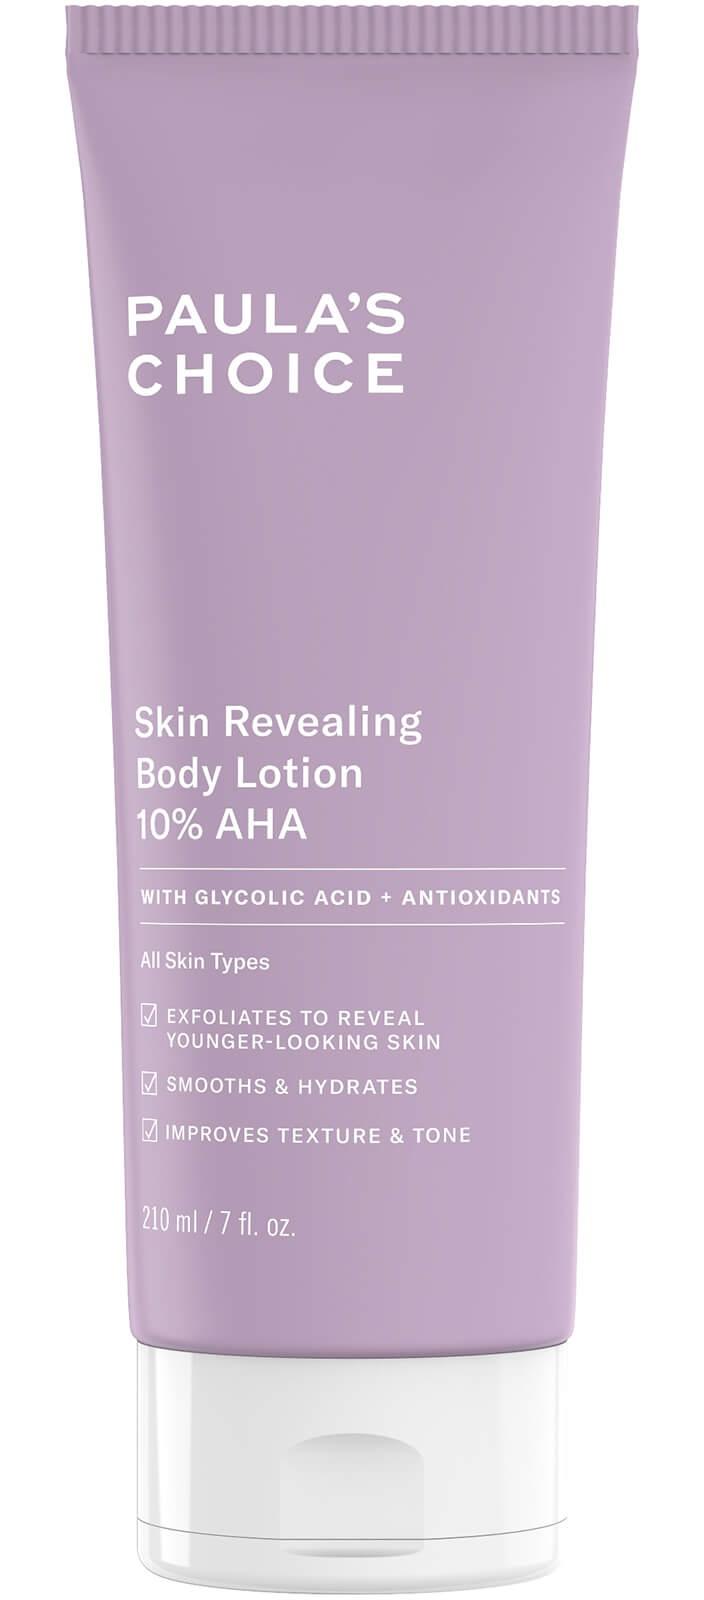 Paula's Choice Skin Revealing Body Lotion 10% Aha